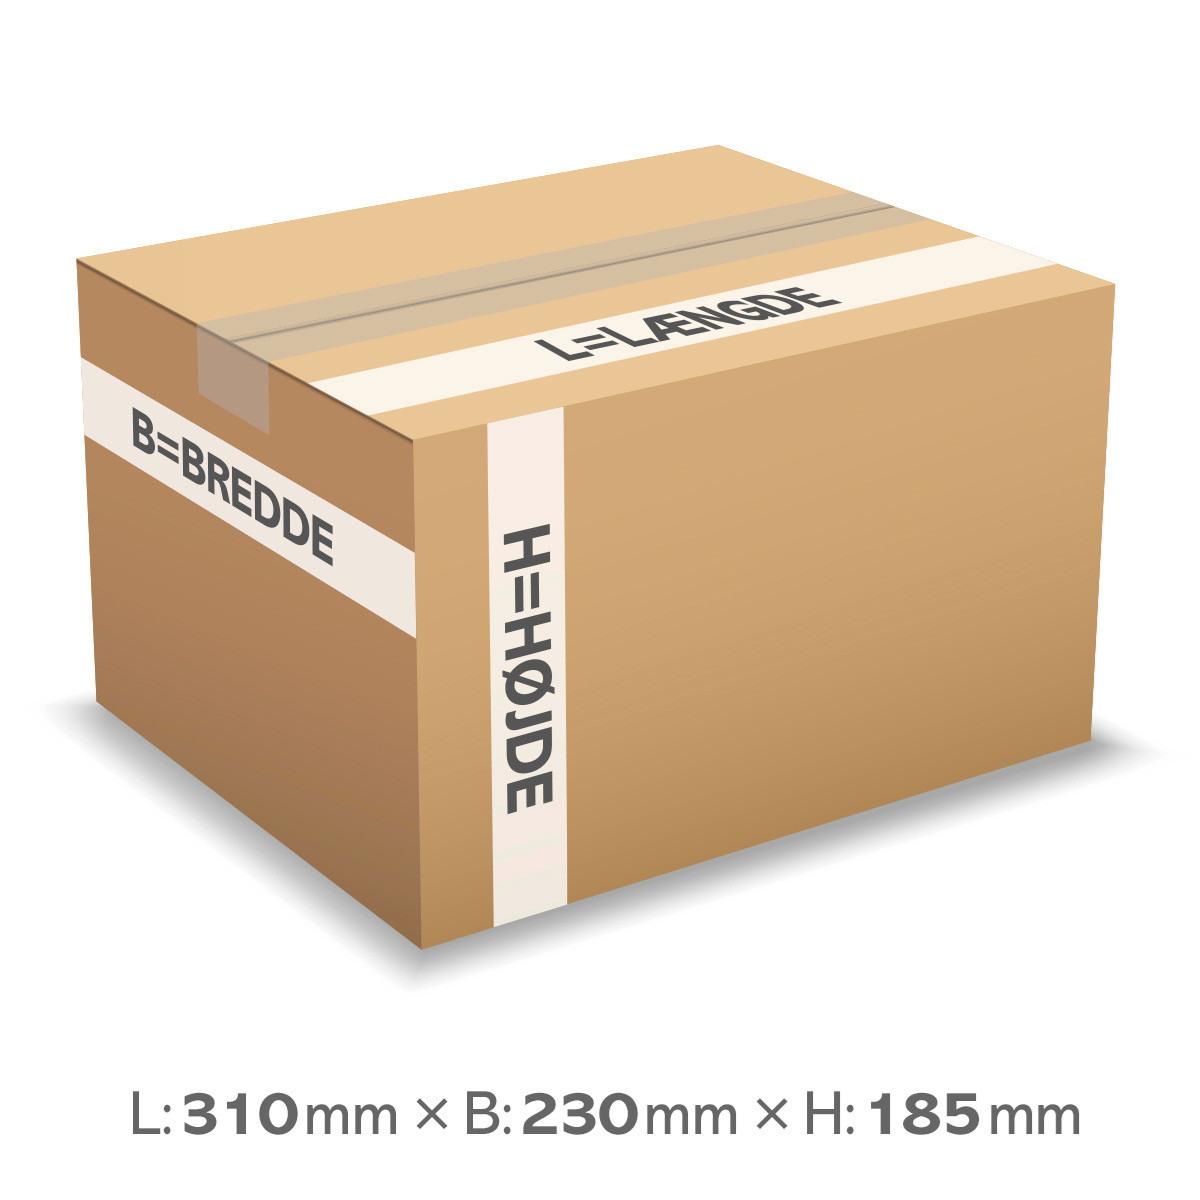 Papkasser 310 x 230 x 185 mm 1263 (A4) - 13L - 3mm